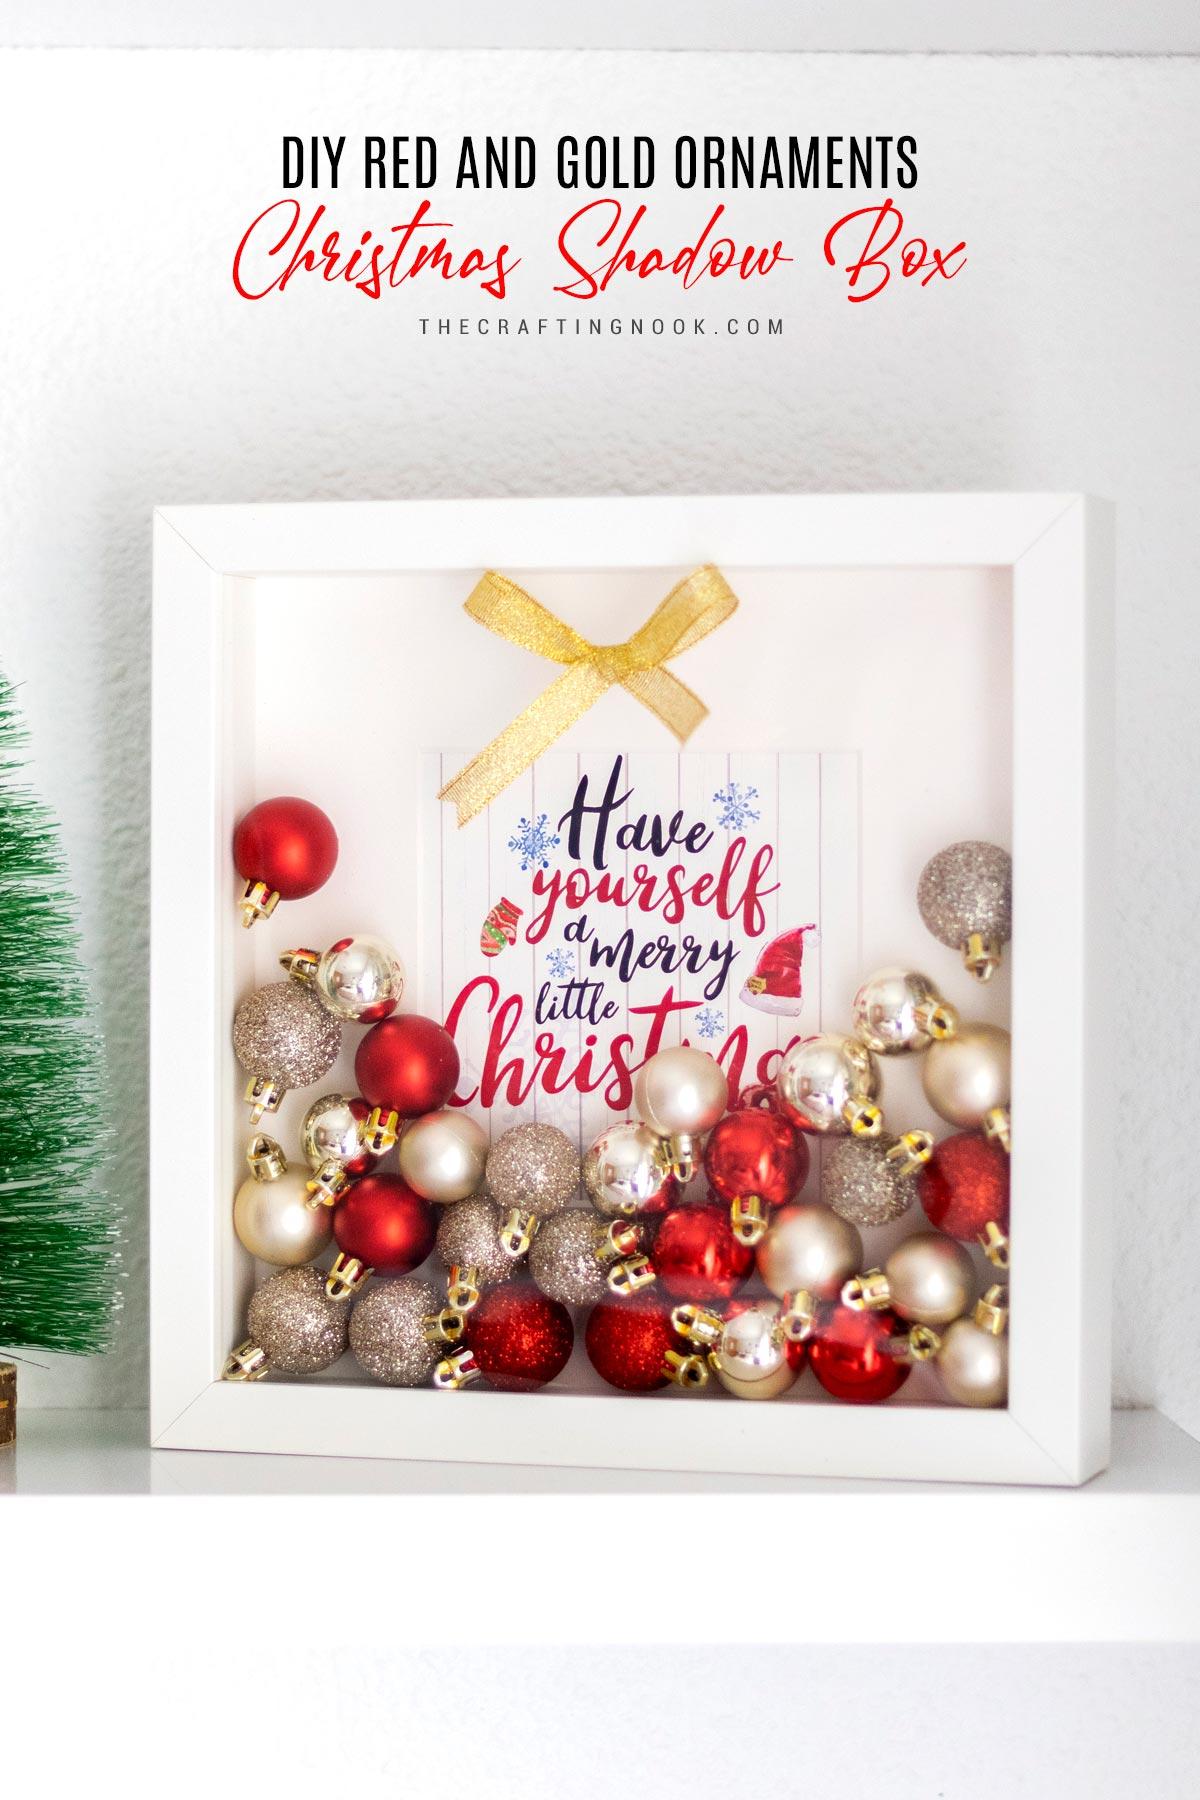 Lovely Christmas Ornaments Shadow Box DIY